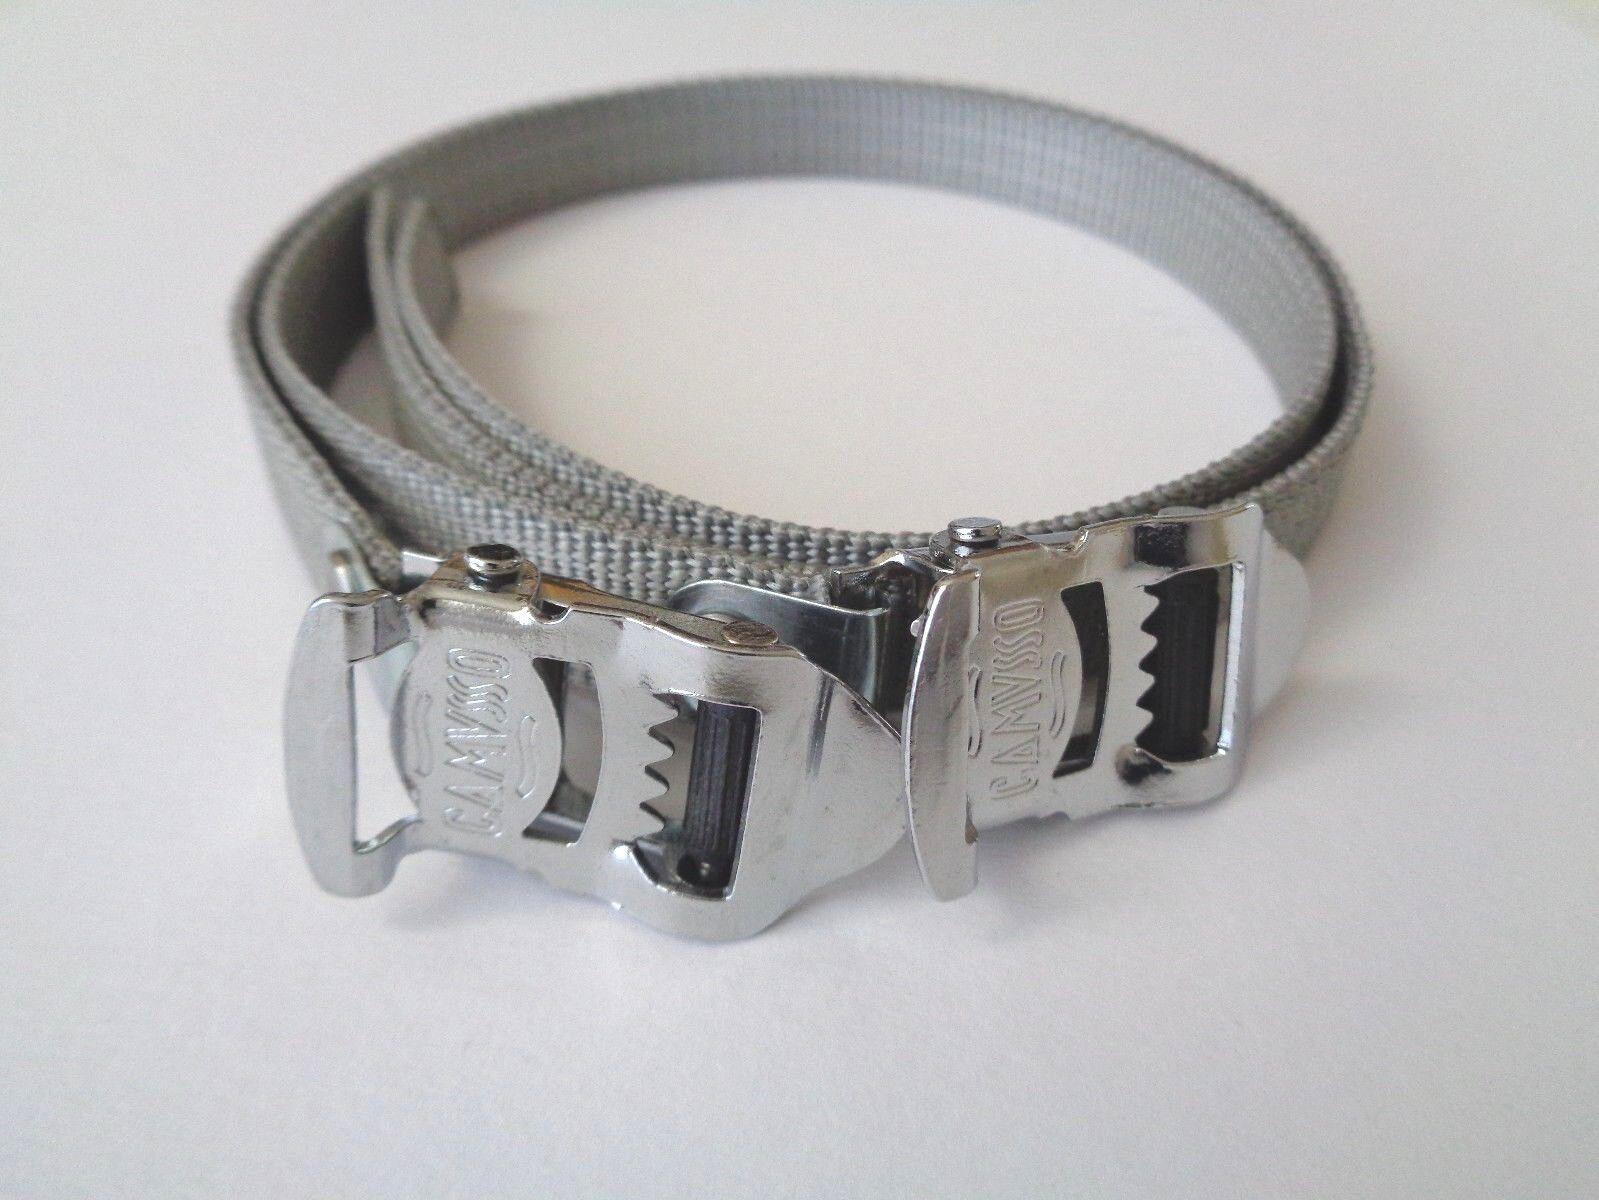 NOS Vintage 1980s CAMUSSO Italian grey nylon toe straps (one pair)